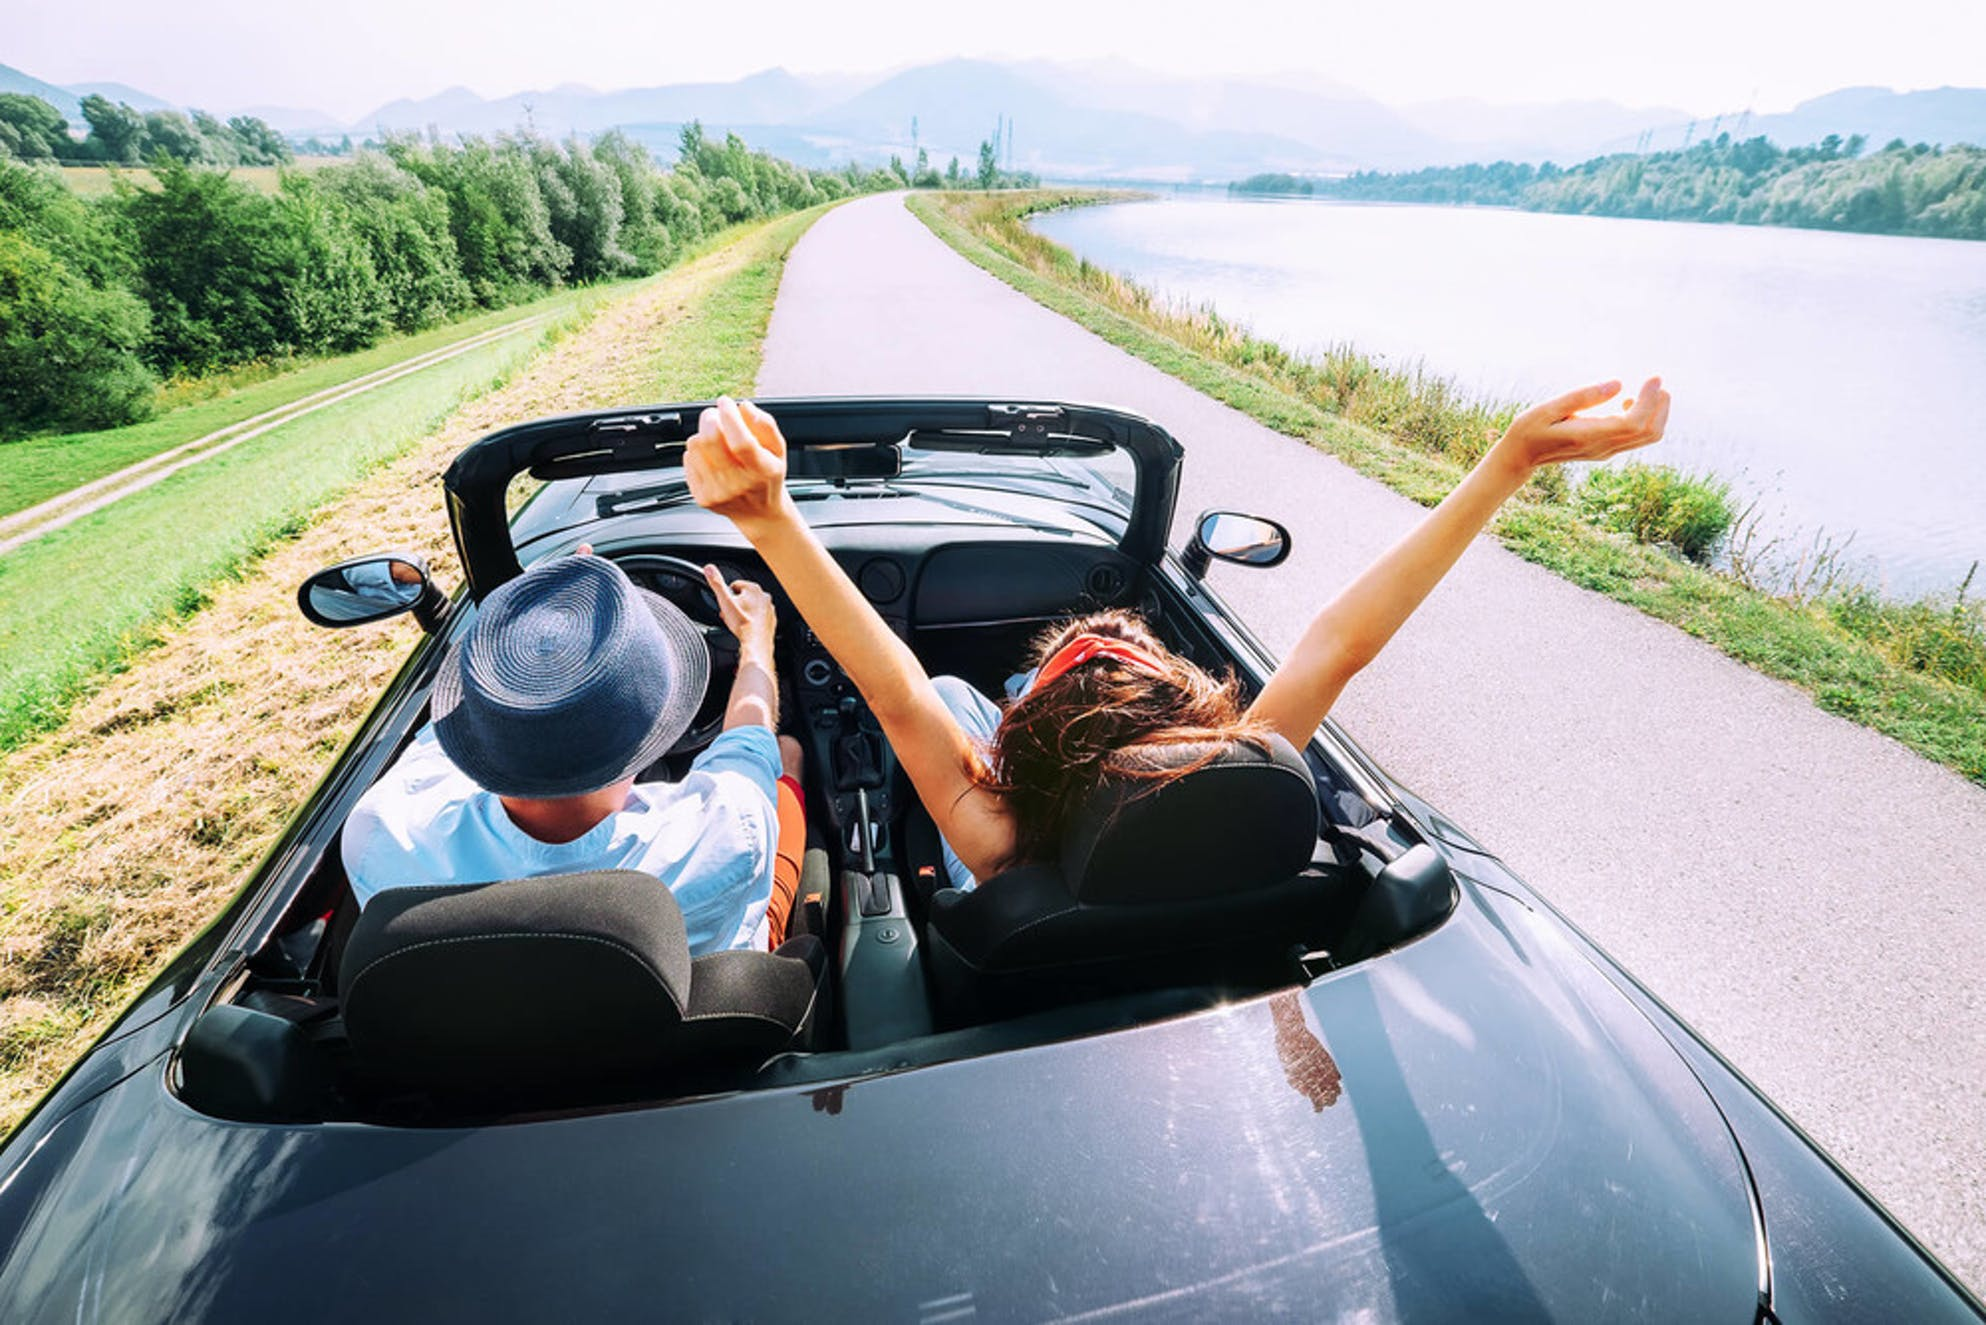 Car rental insurance is a waste of money